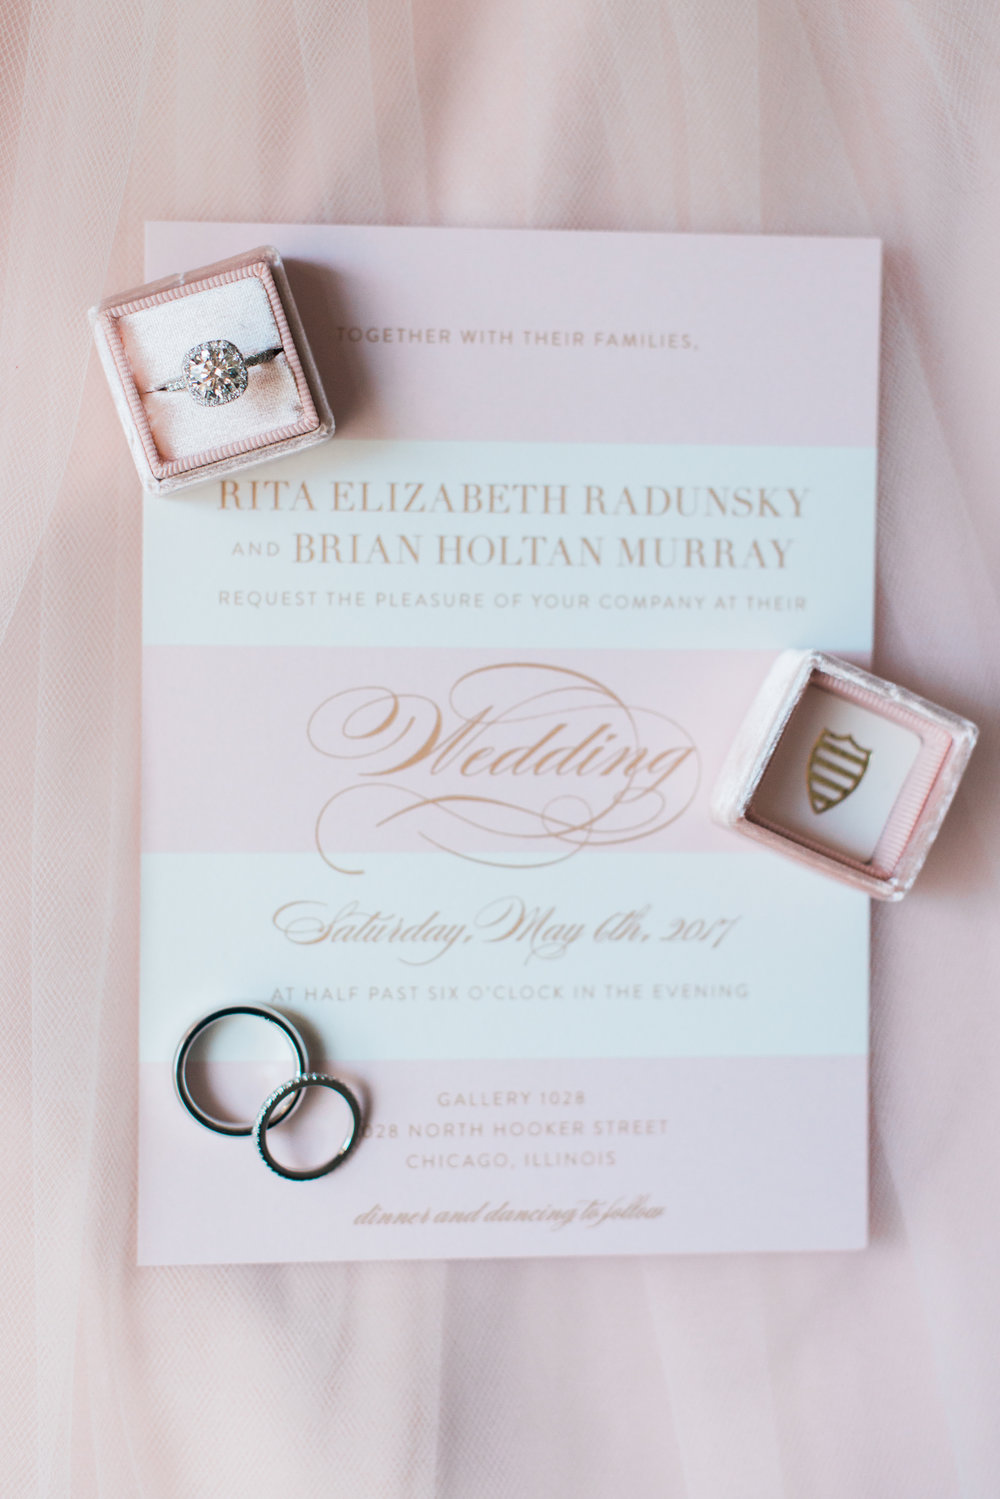 Brittany Bekas - Gallery 1028 Chicago Wedding Photos-3.jpg